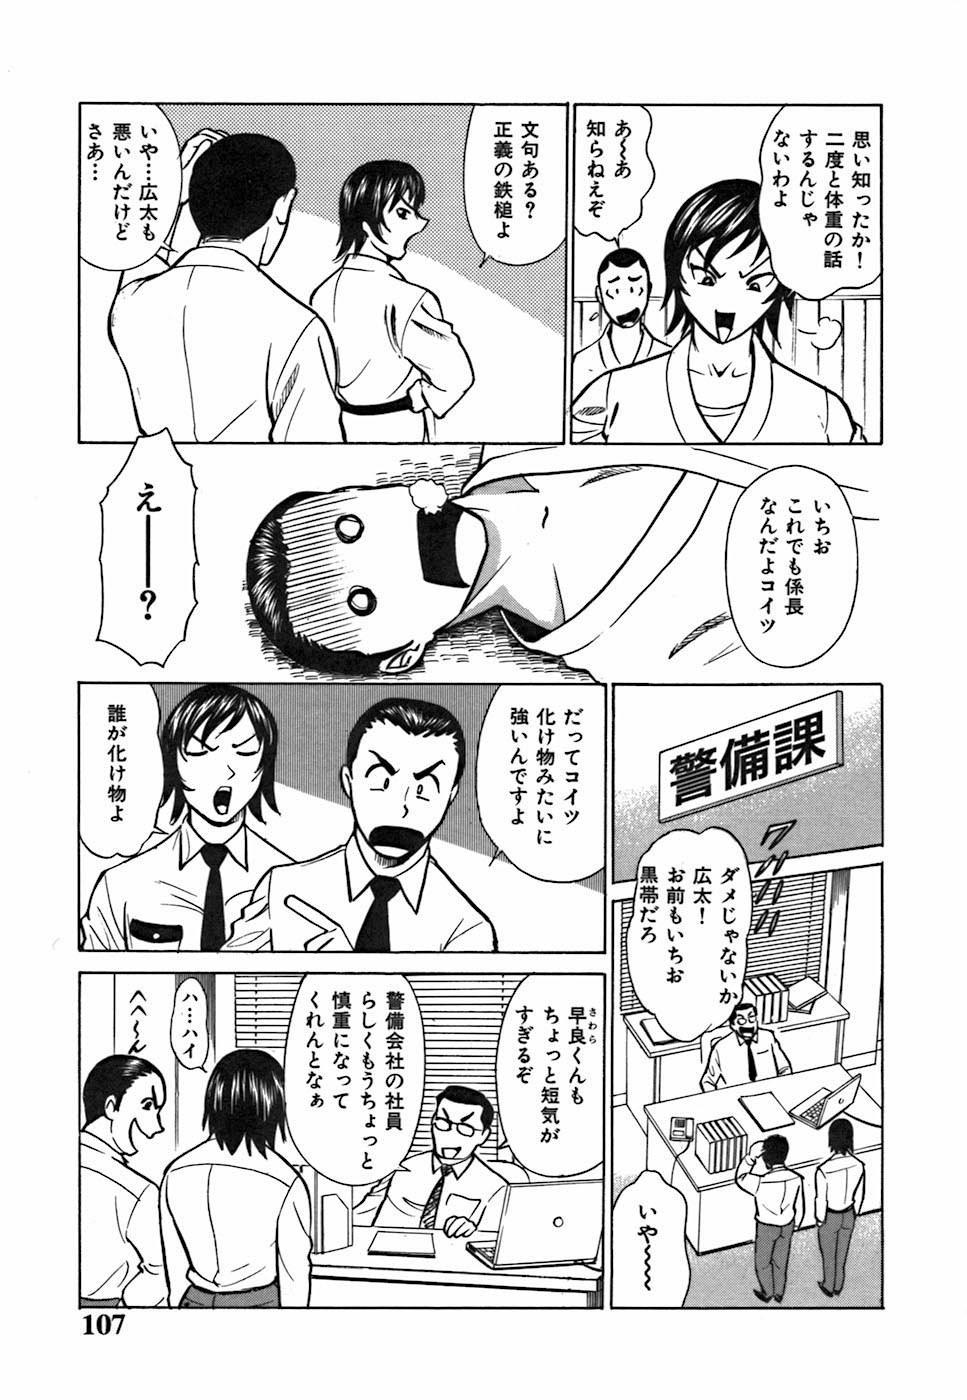 Kimi ga Nozomu Katachi | Appearance for which you hope 106